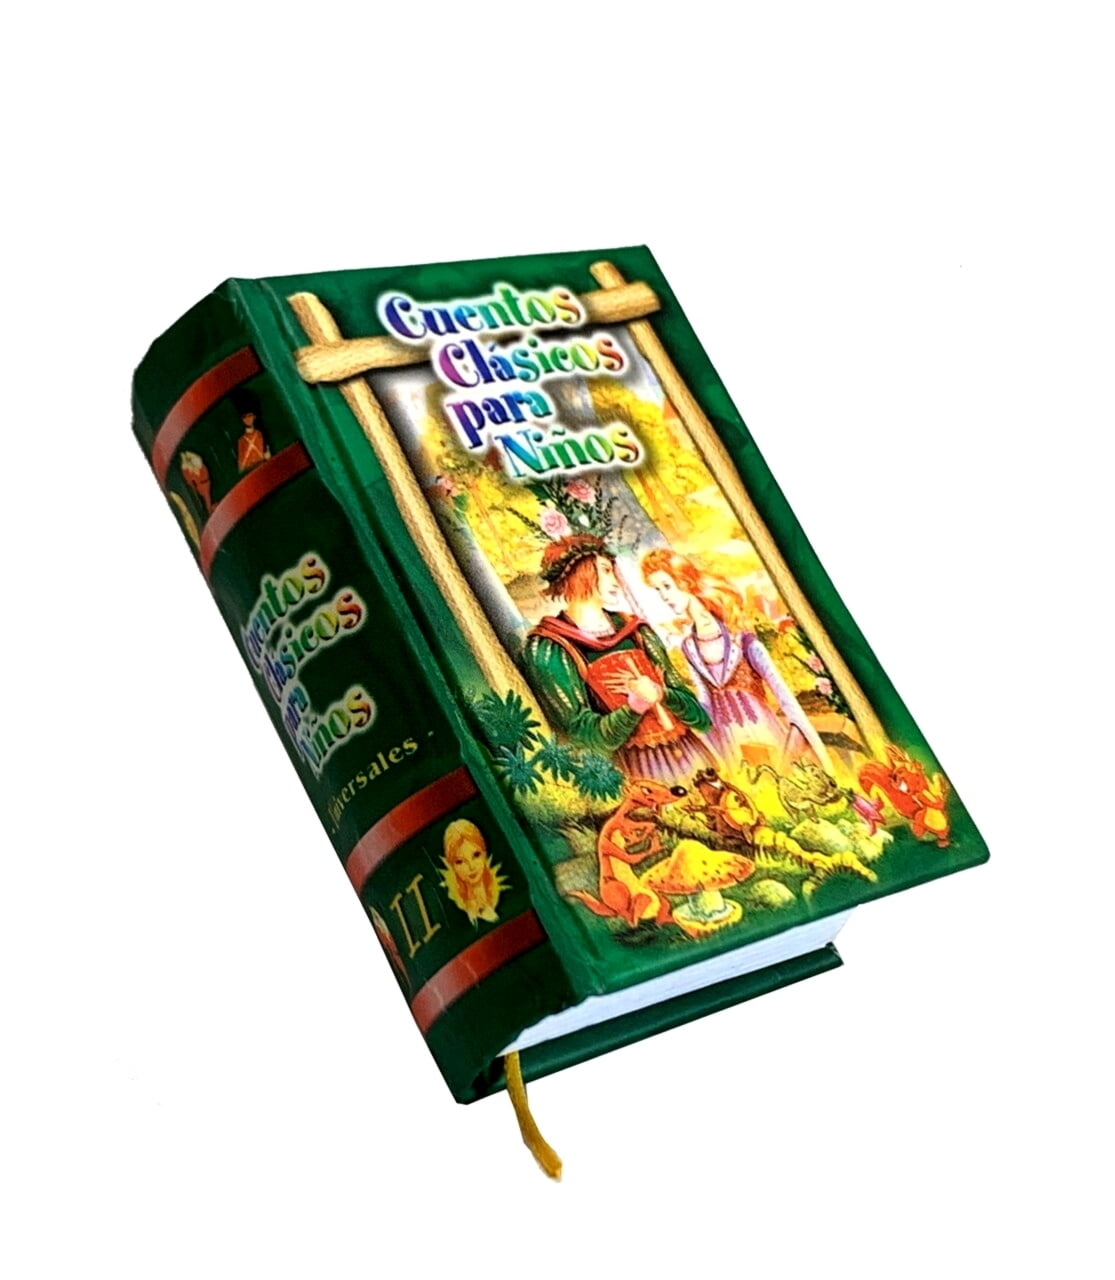 Cuentos-clasicos-II-miniature-book-libro